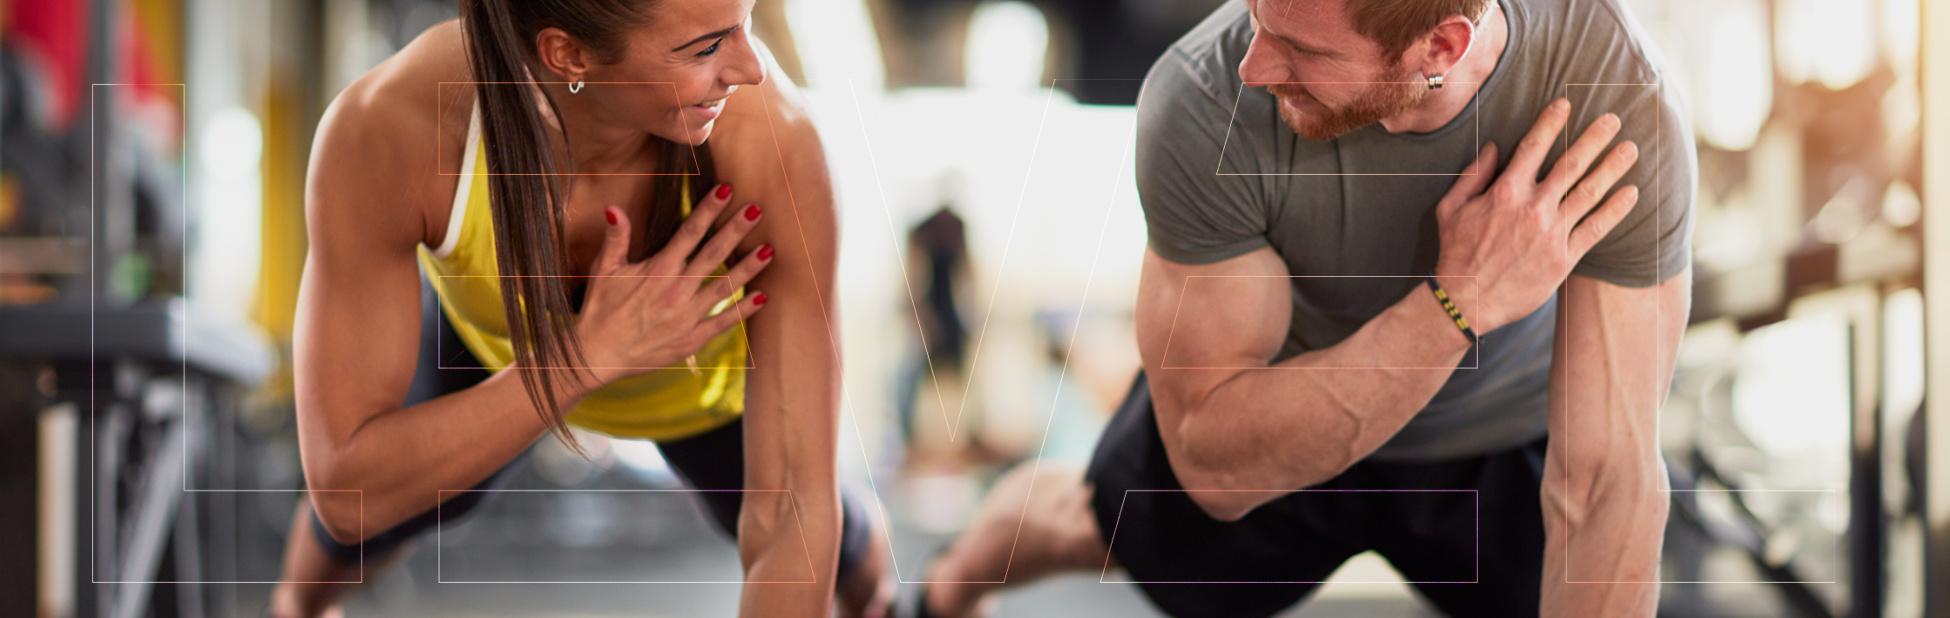 Klub fitness Aleksandrów Łódzki